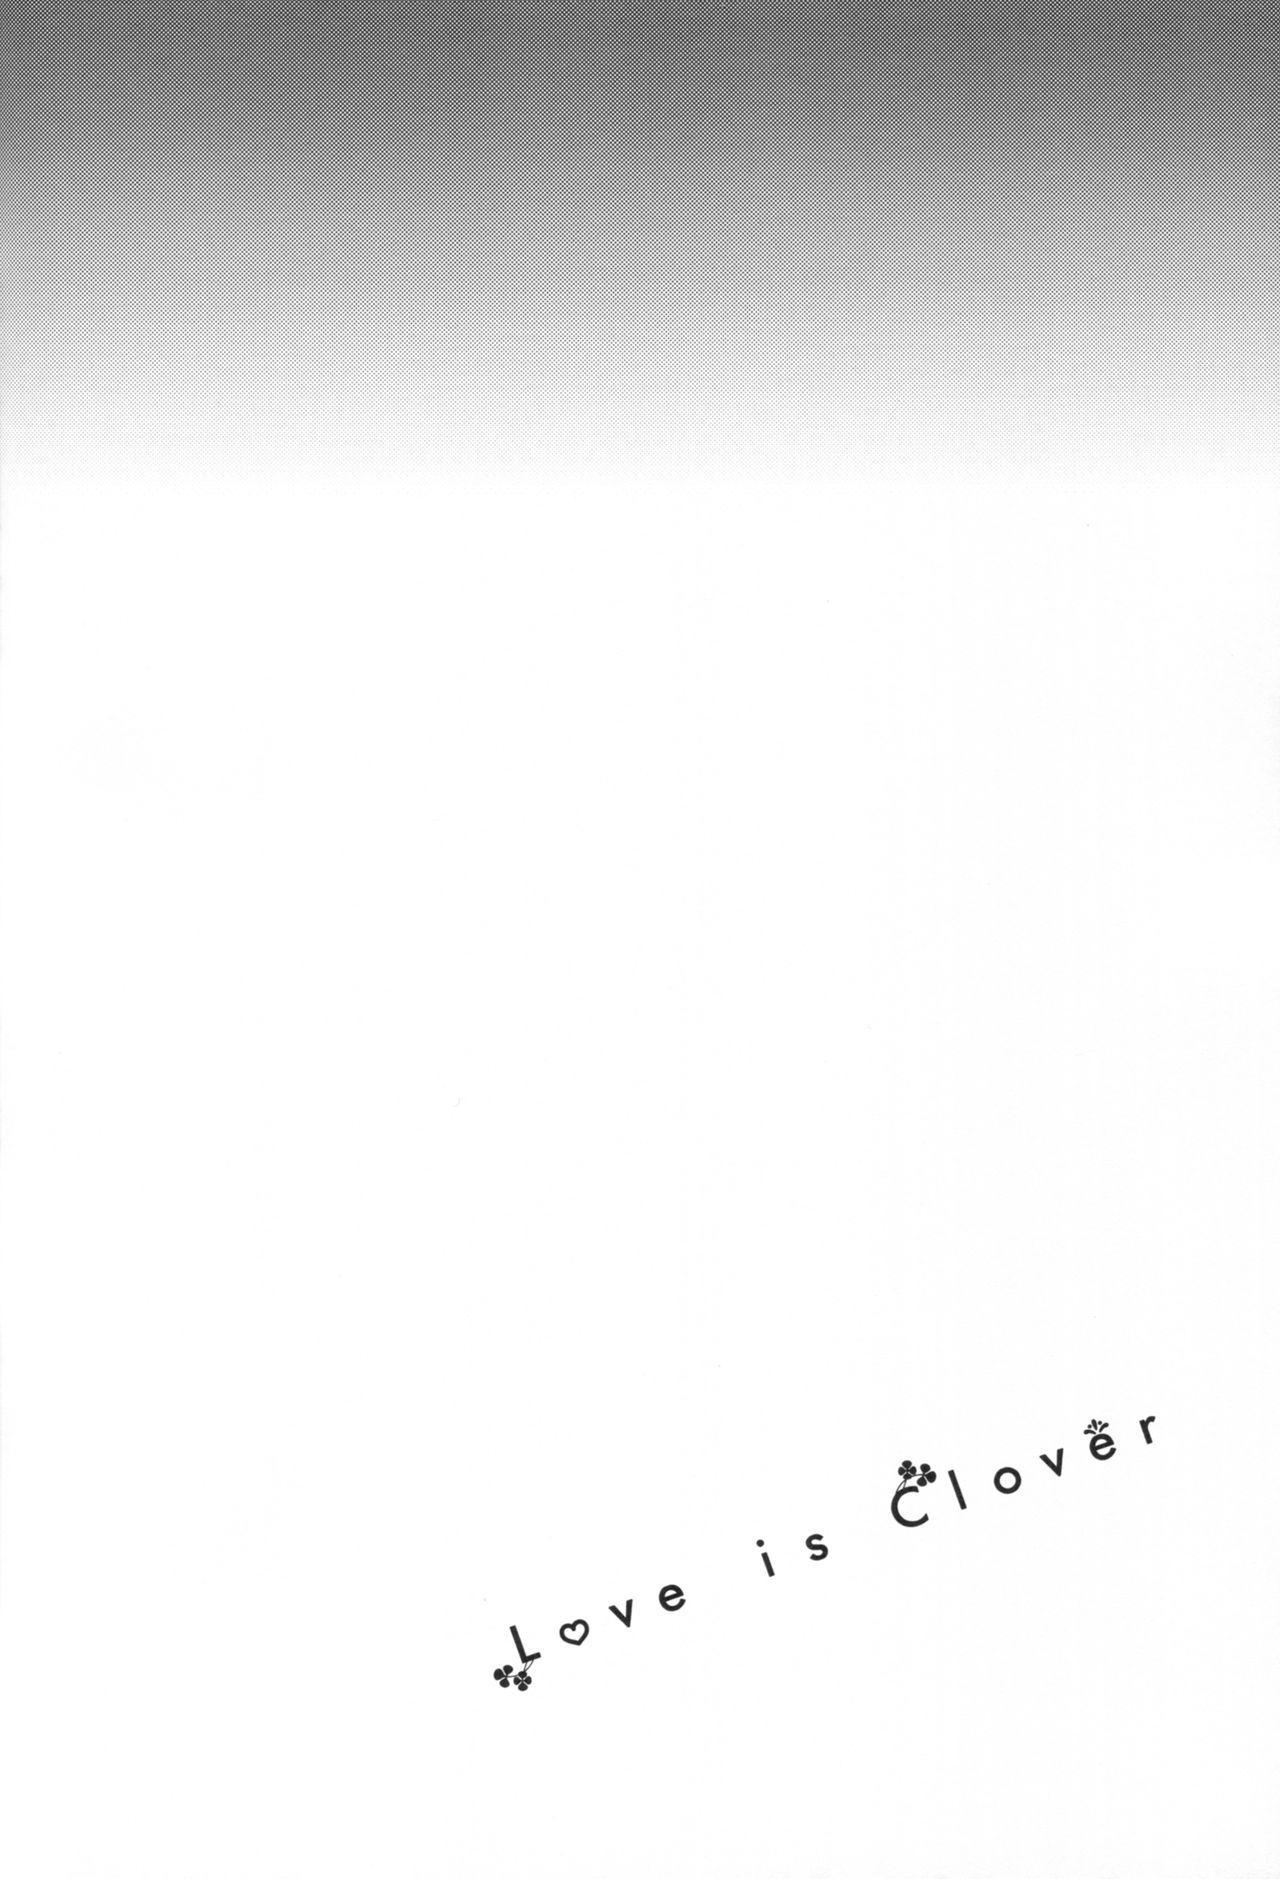 Love is Clover 2